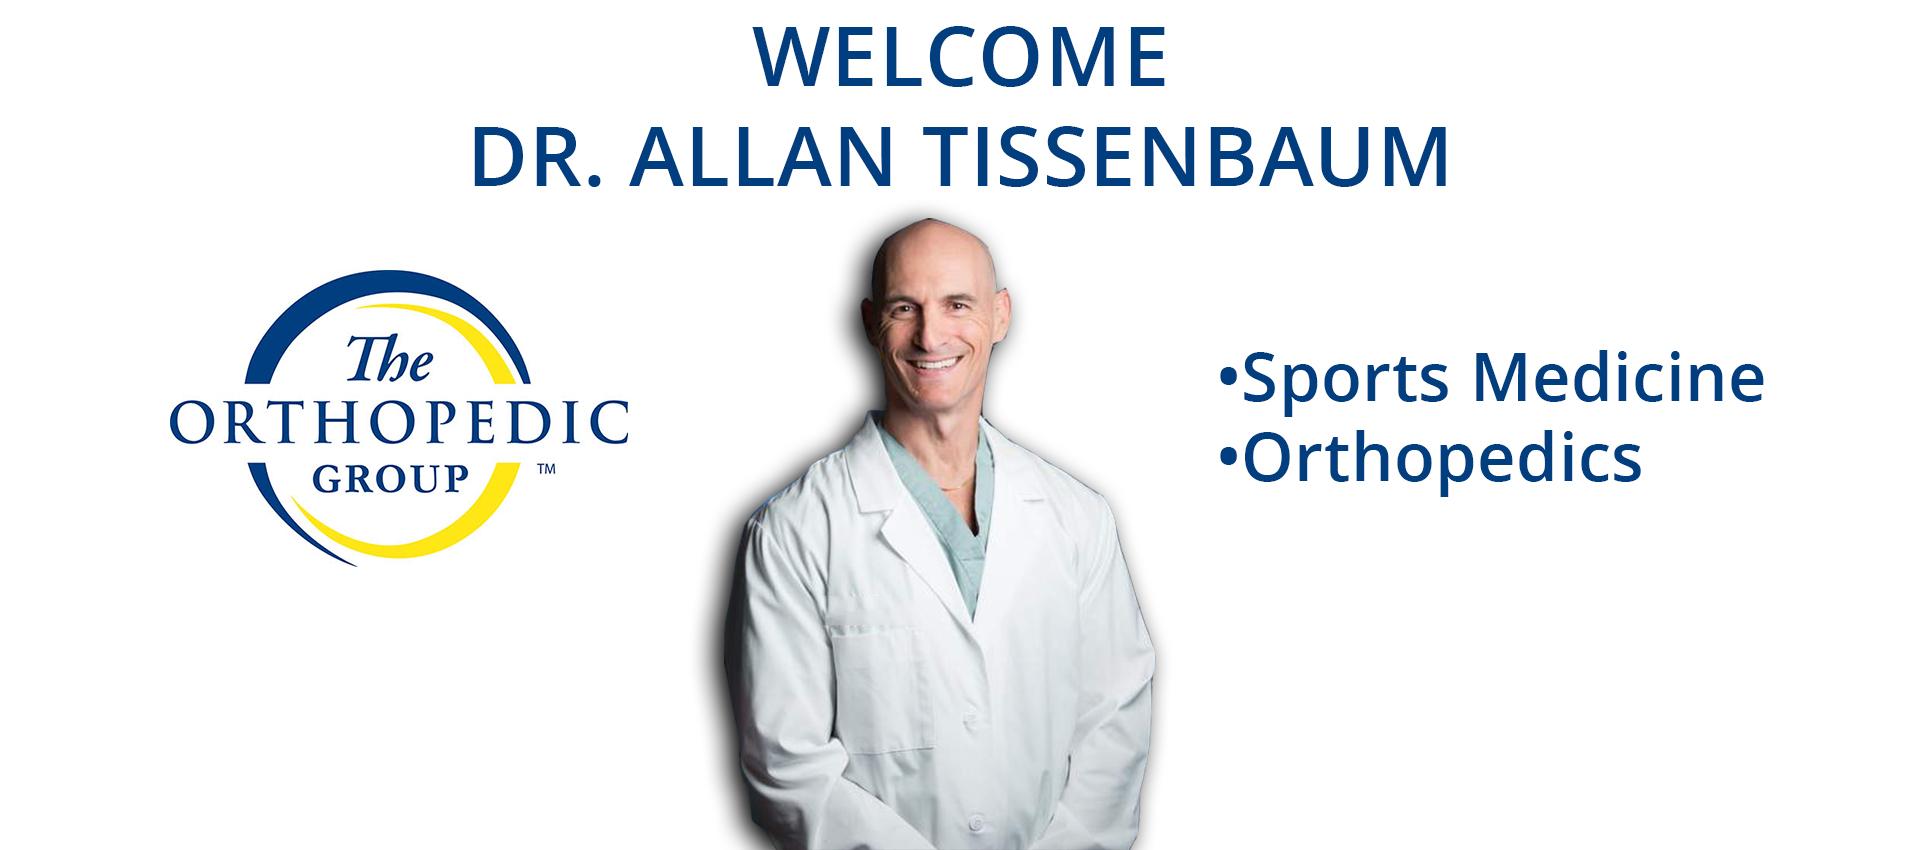 sports medicine fellowship experience